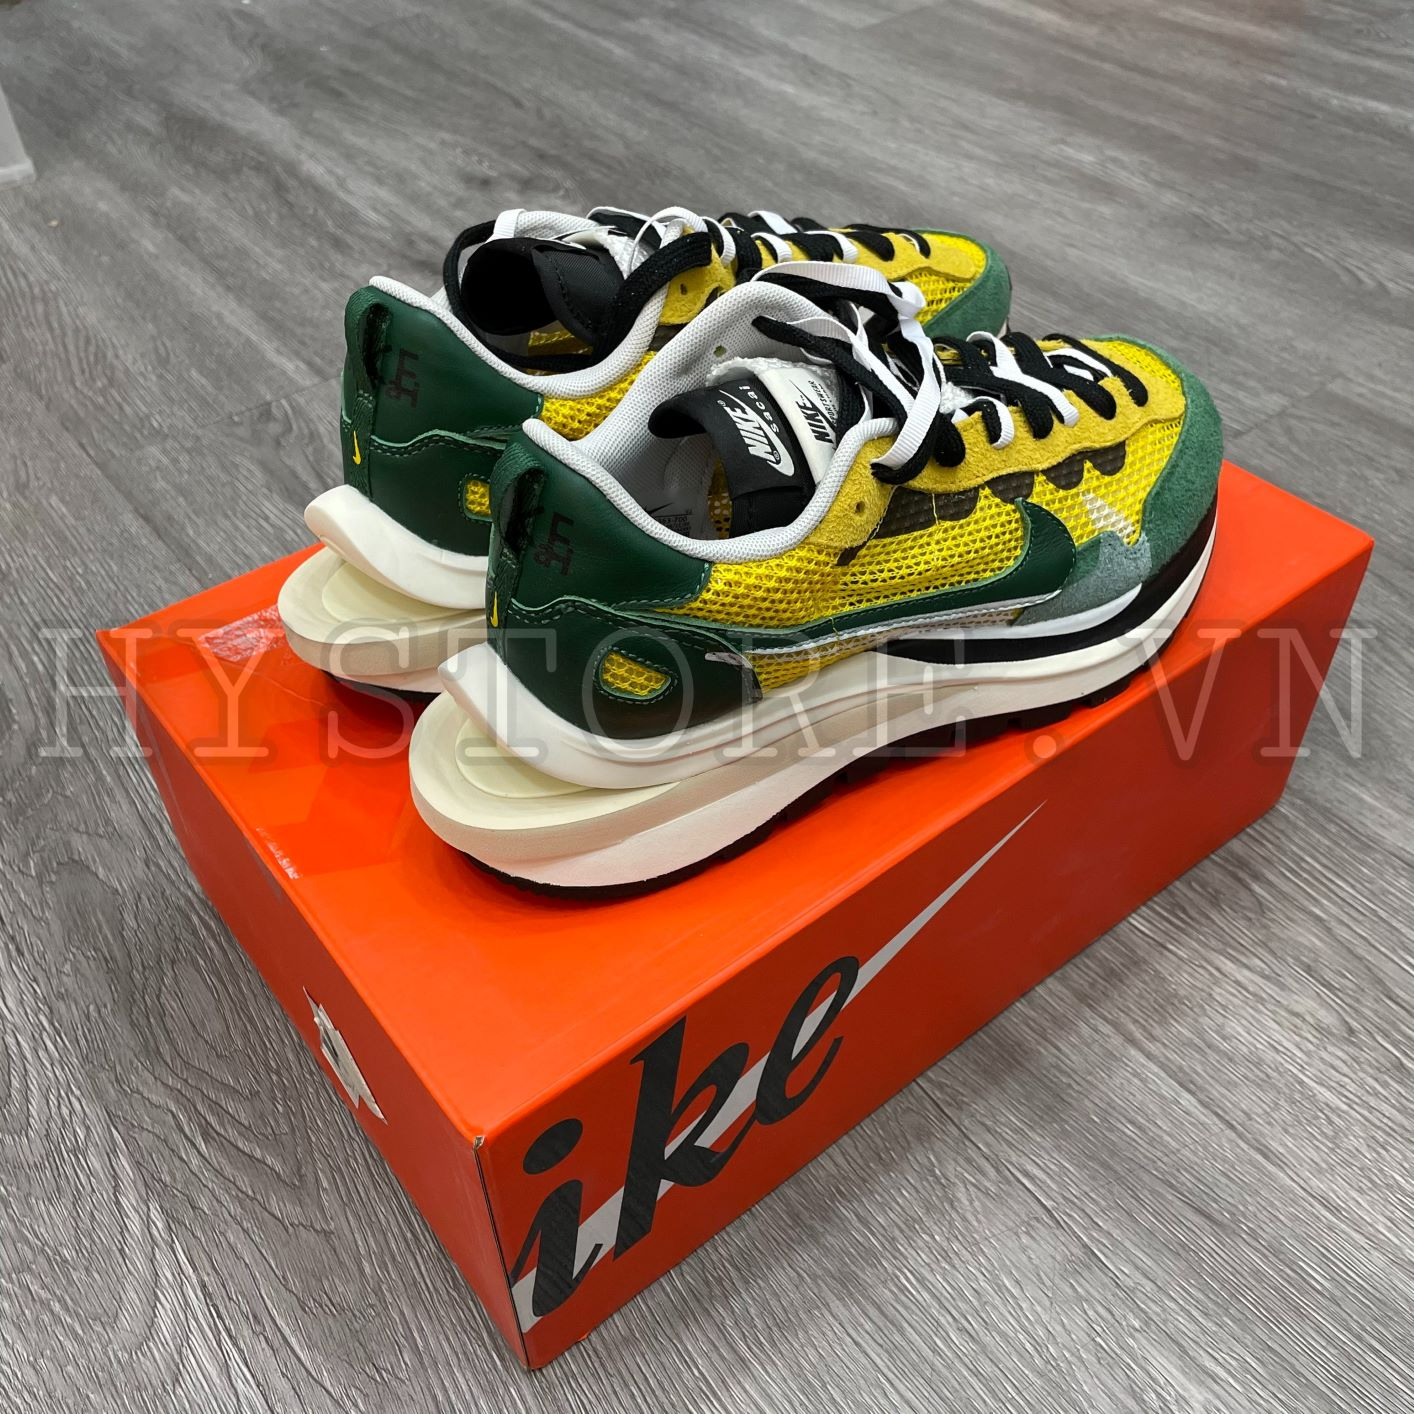 Giày Nike Sacai Vaporwaffle 3.0